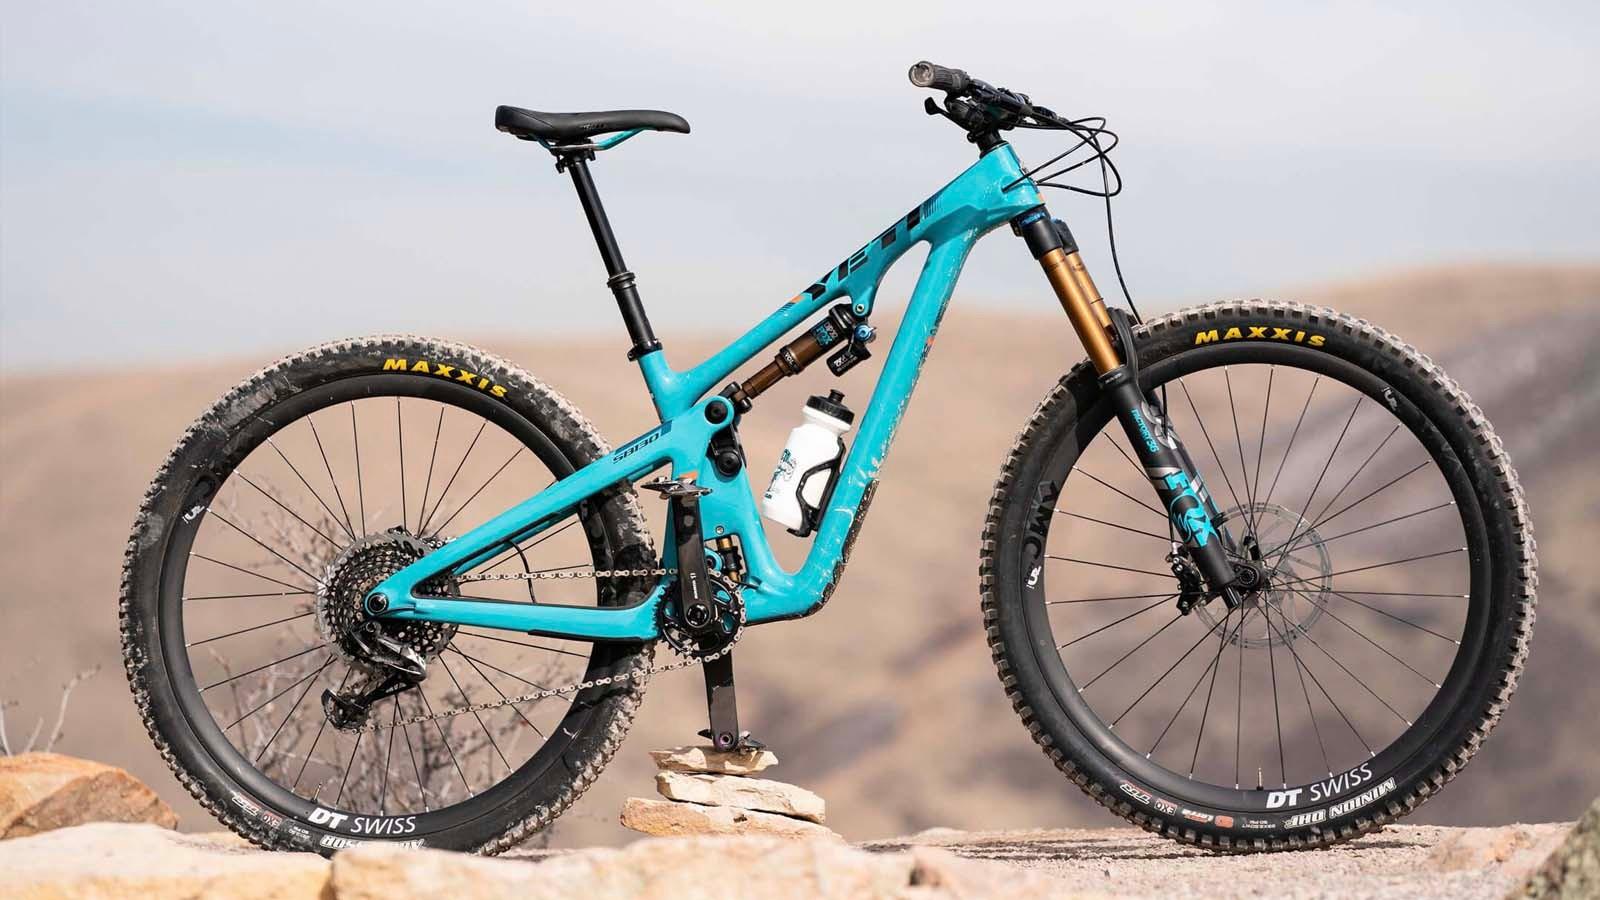 Yeti Sb 130 Lr Price Weight Details Cycling Ball